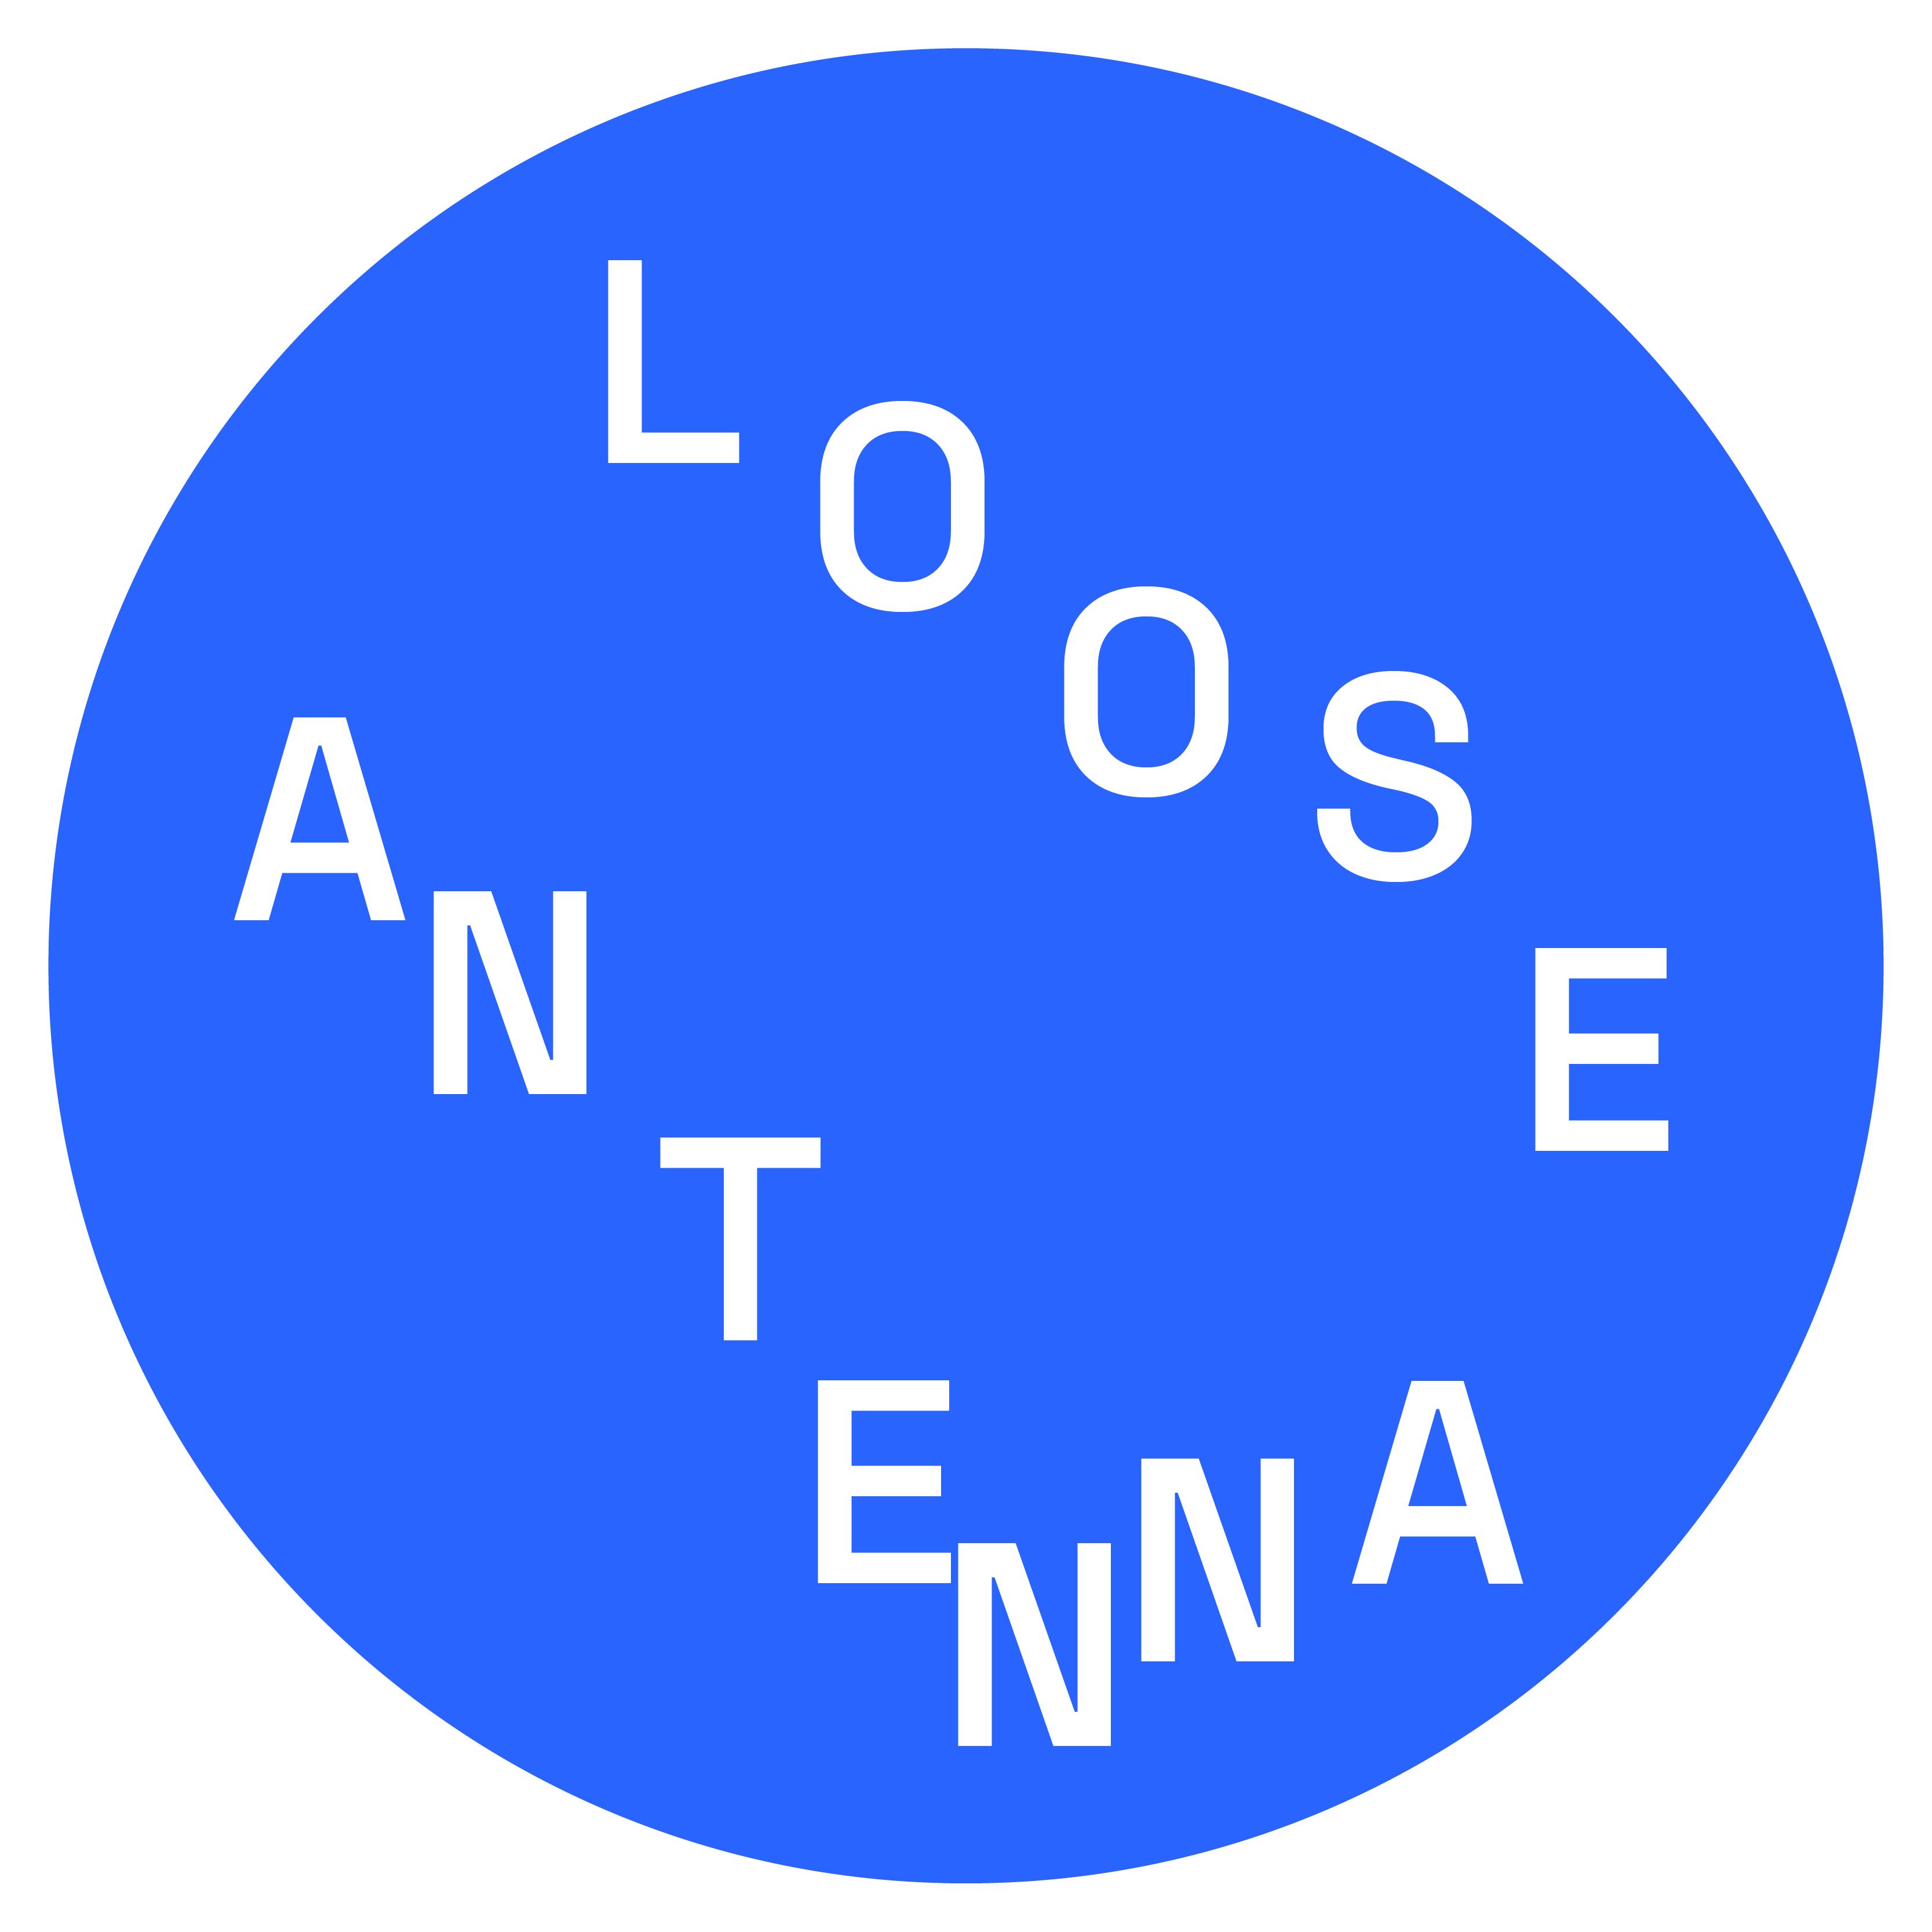 Loose Antenna